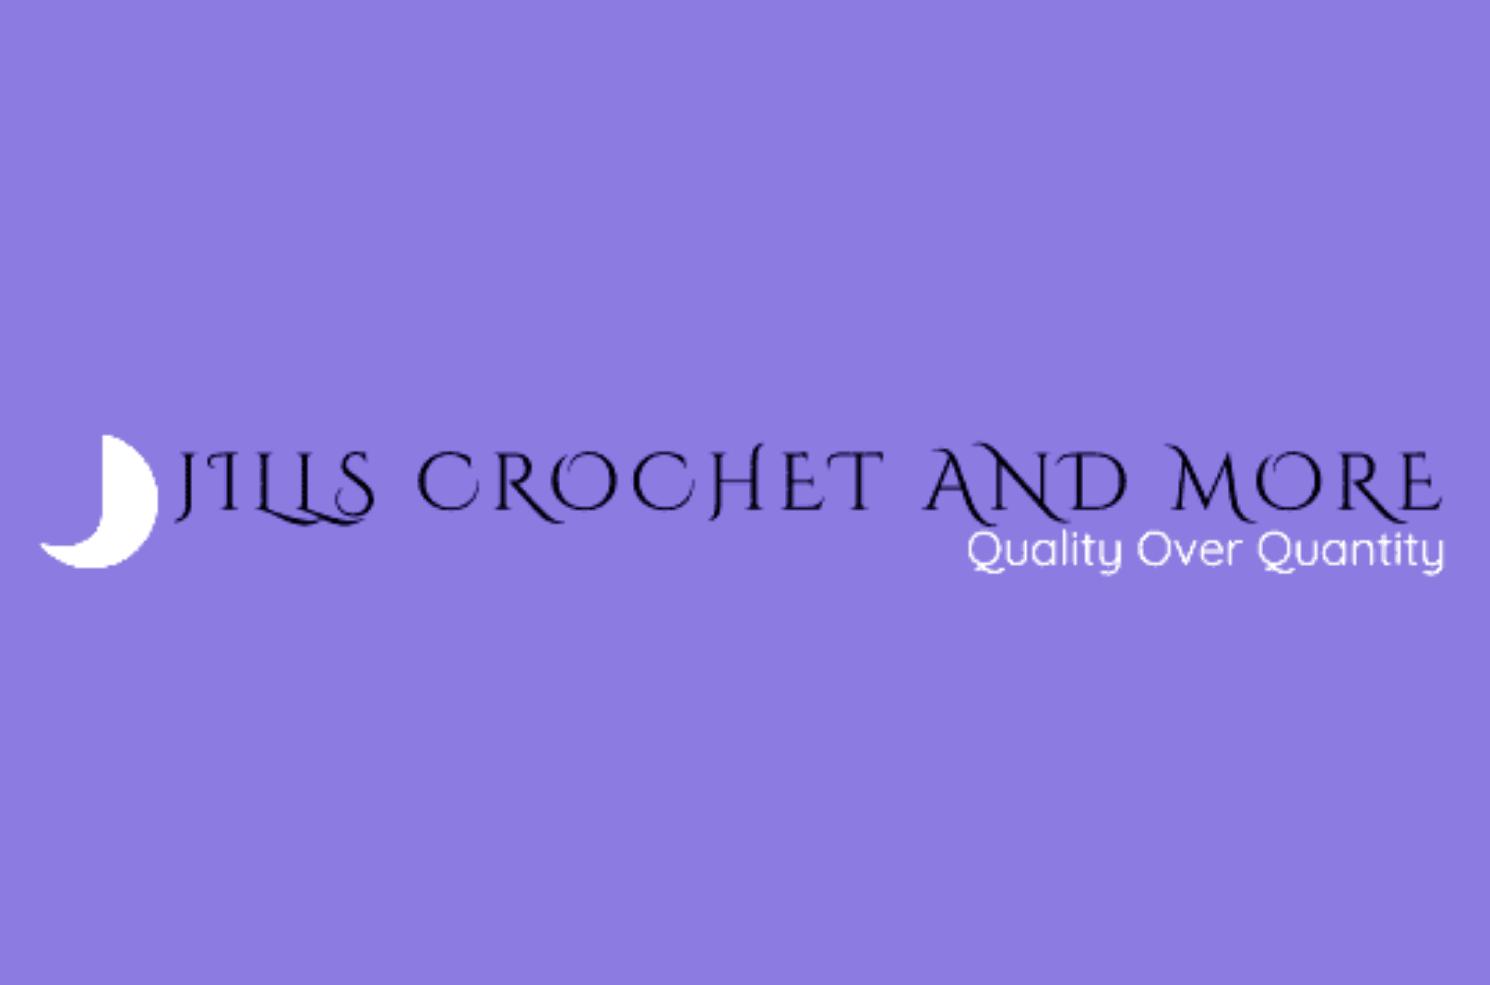 Jills Crochet and More